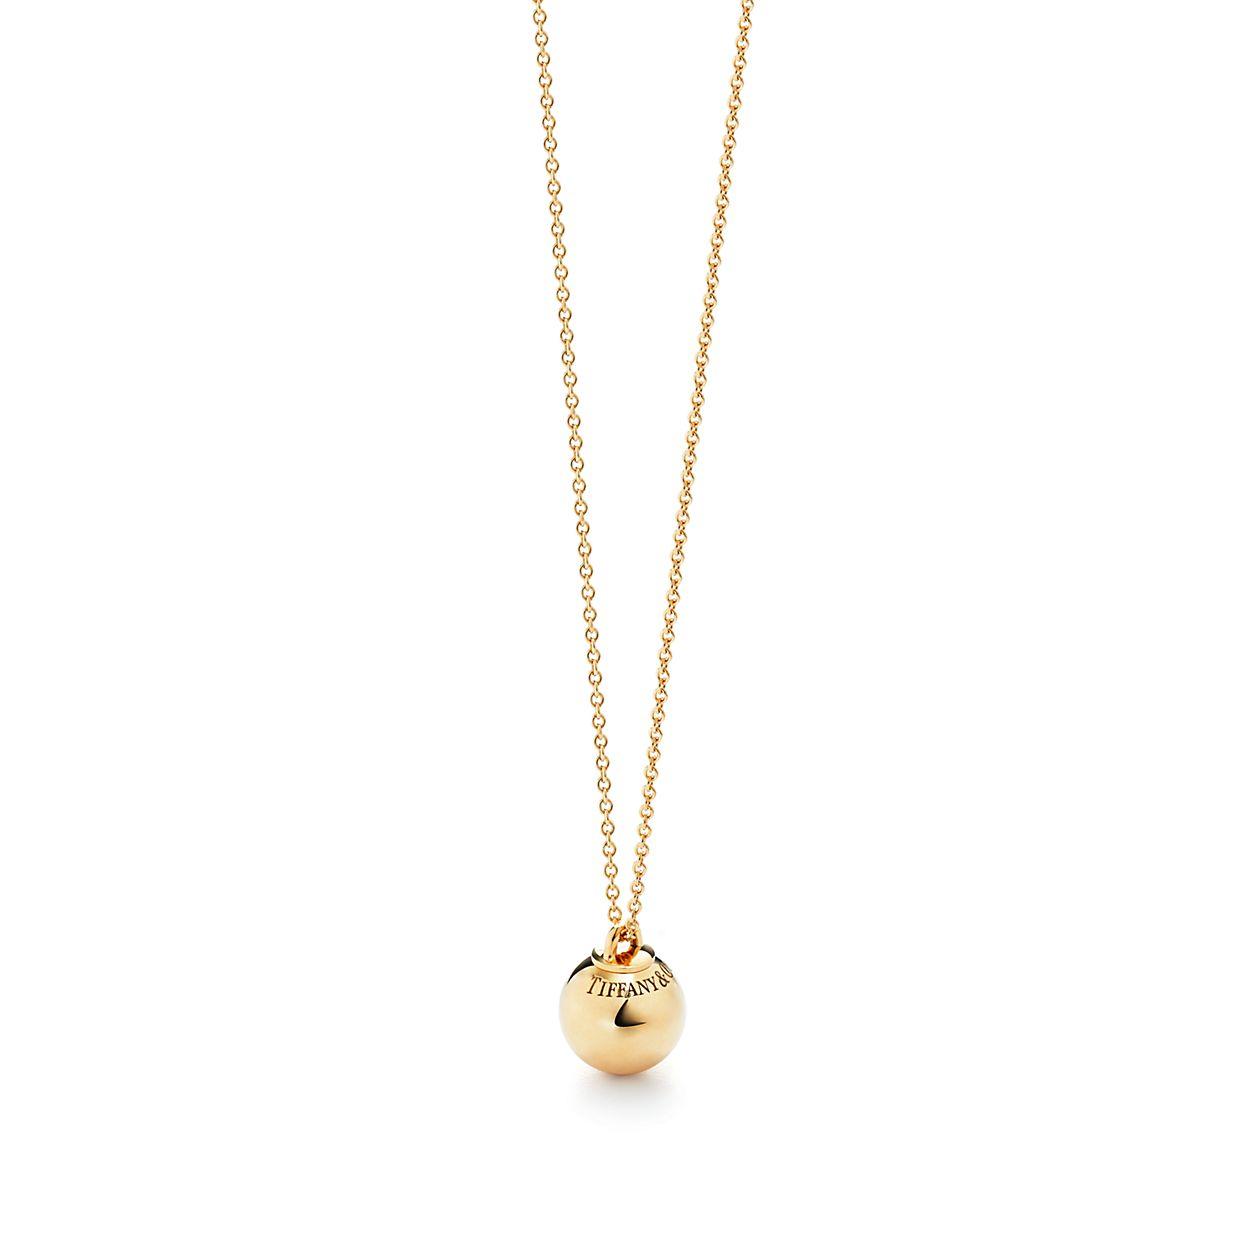 Shop Tiffany HardWear 18K Gold Ball Pendant | Tiffany & Co.